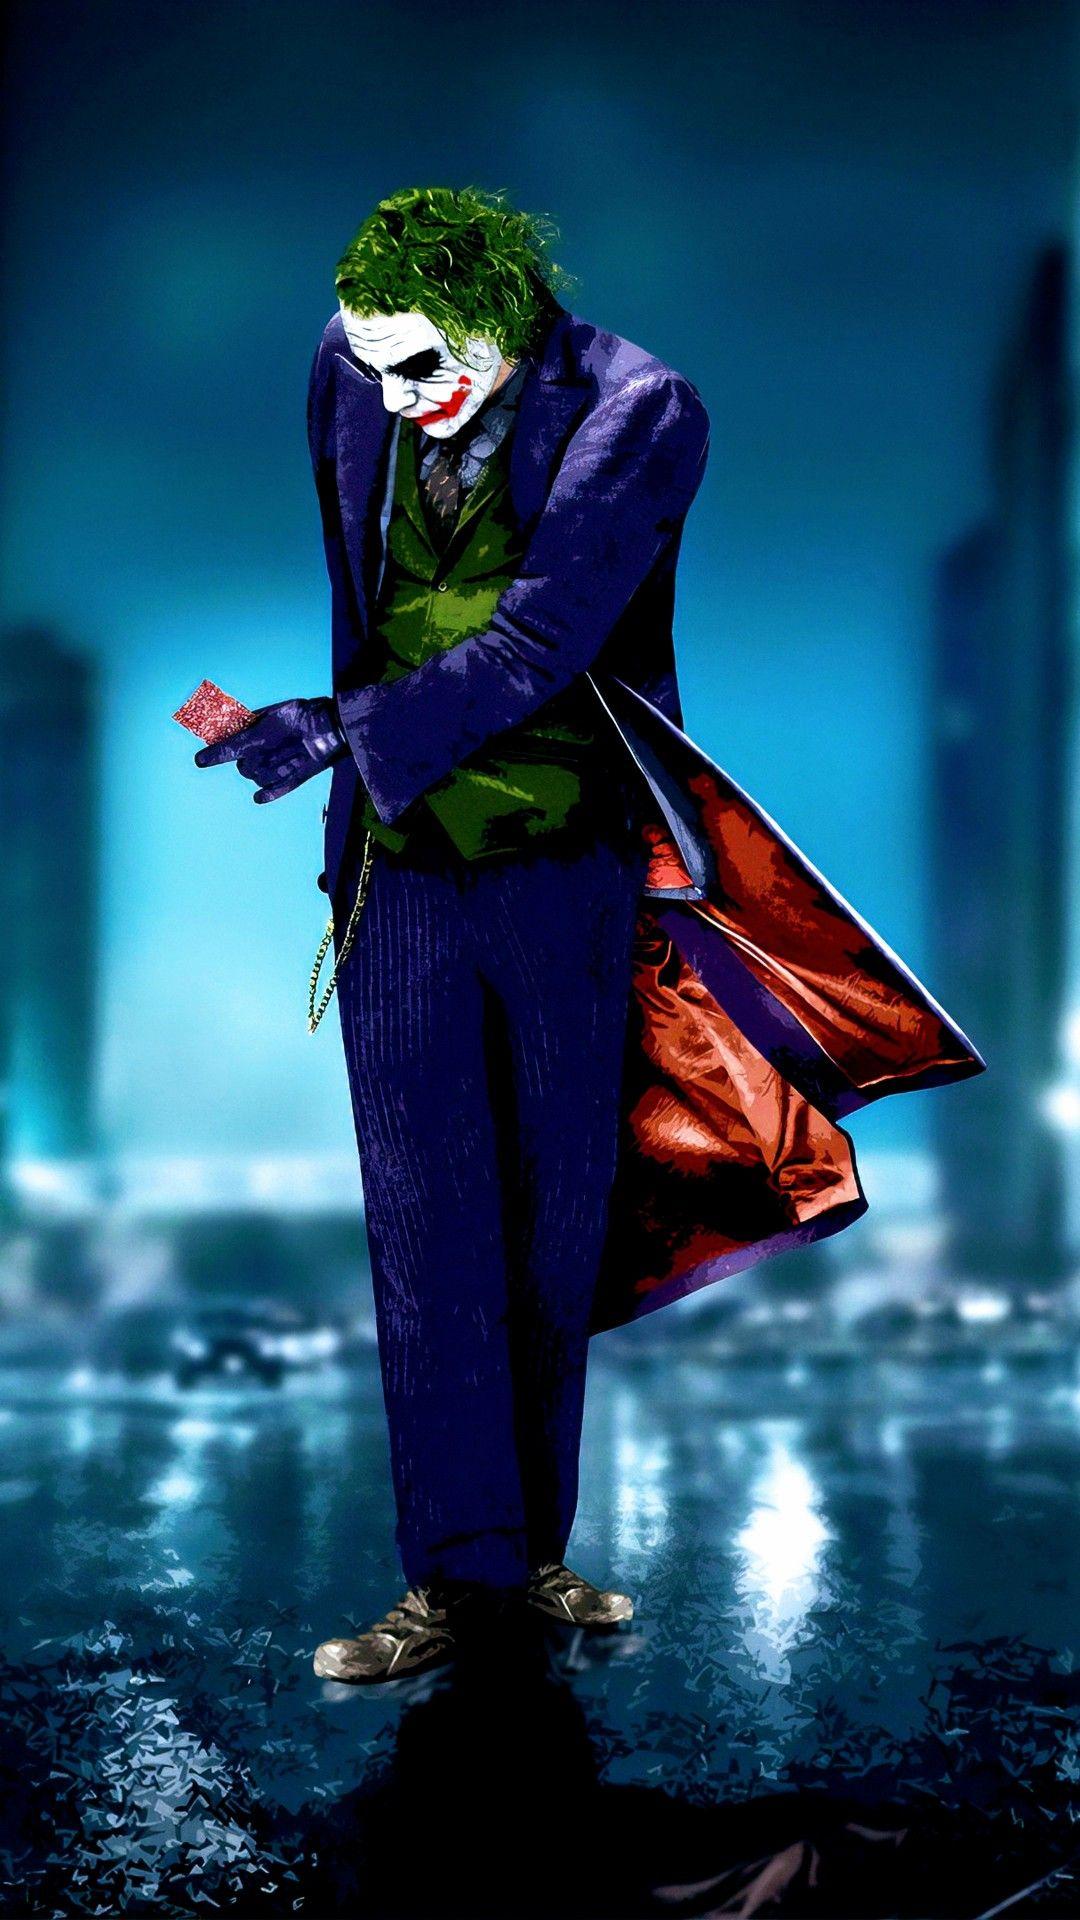 Joker Heath Ledger Batman Joker Wallpaper Joker Wallpapers Joker Poster 3d cool joker wallpaper photos